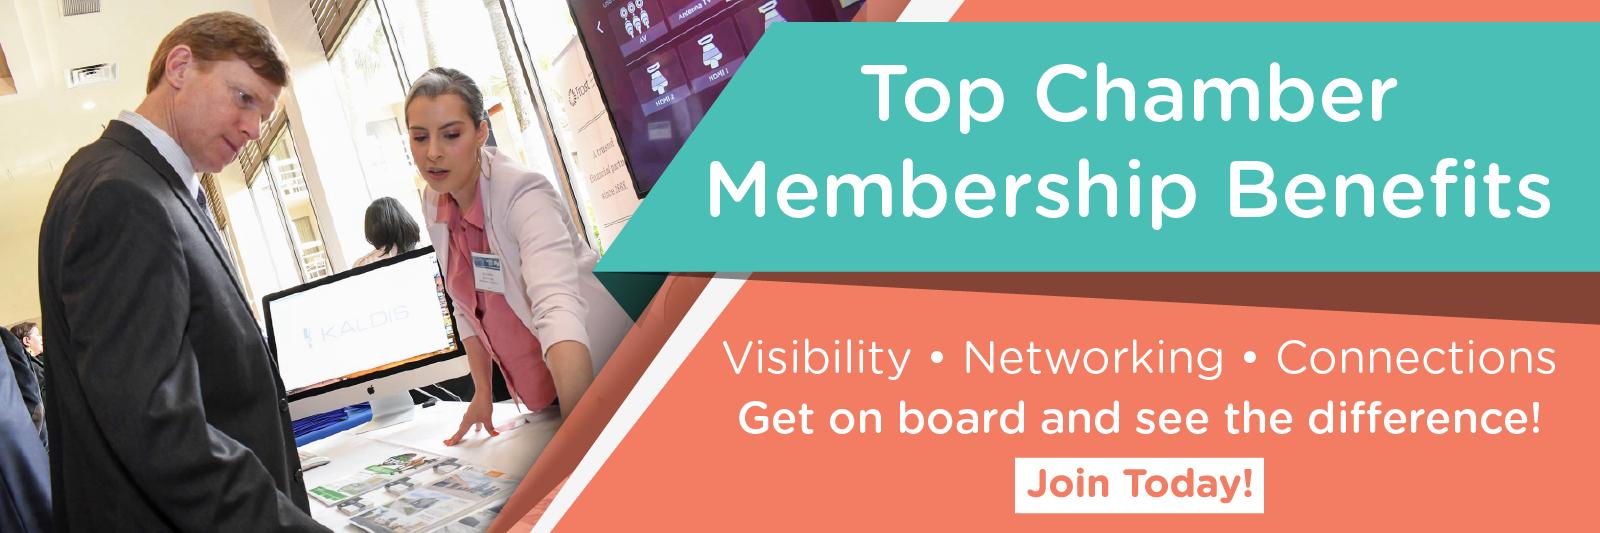 EECOC_Membership-Banner_v2-01.png